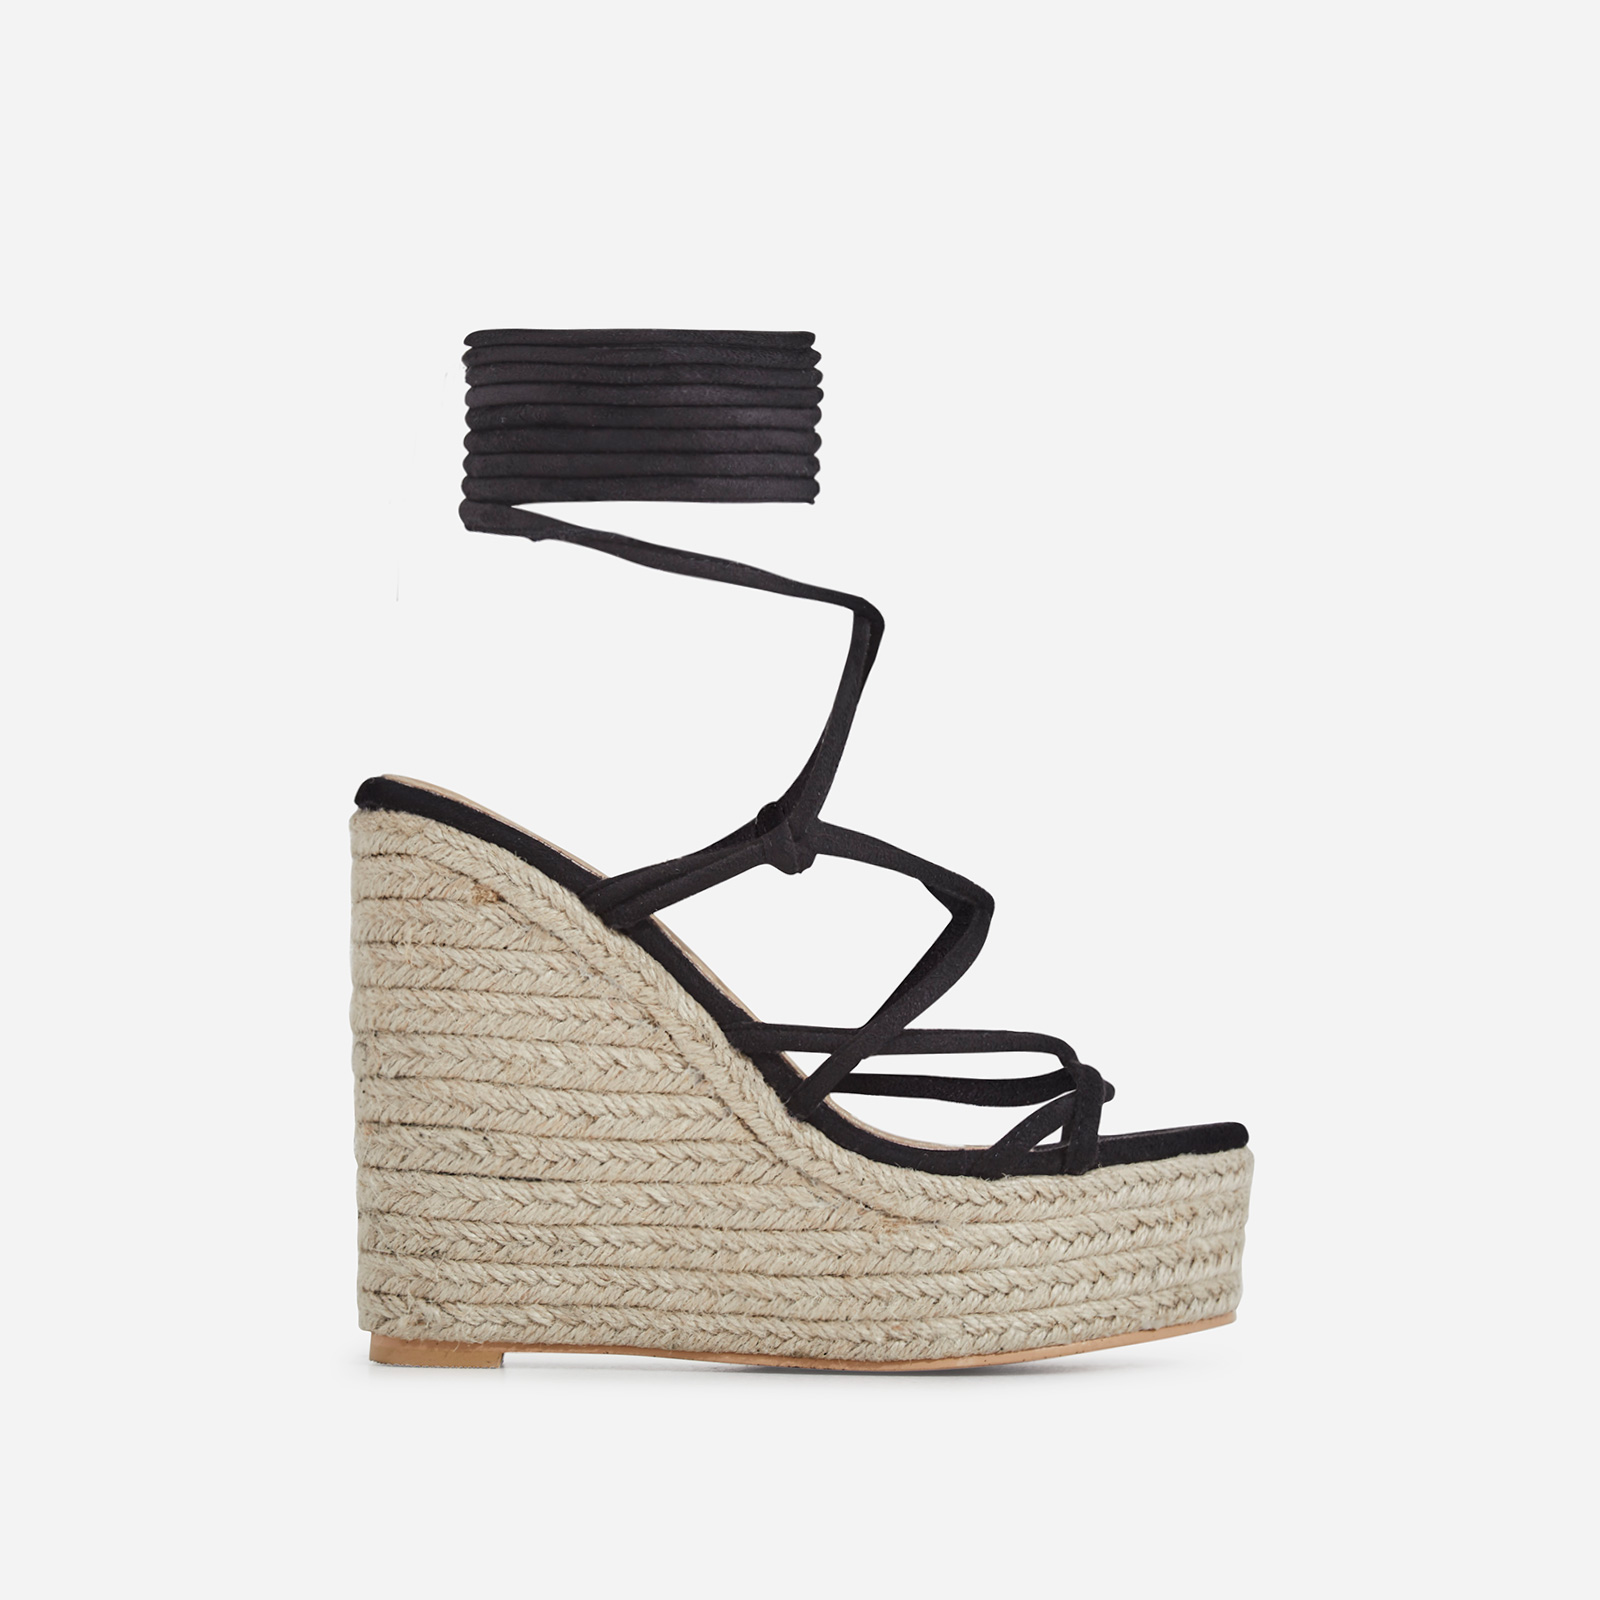 Hanna Platform Lace Up Espadrille Wedge Block Heel In Black Faux Suede